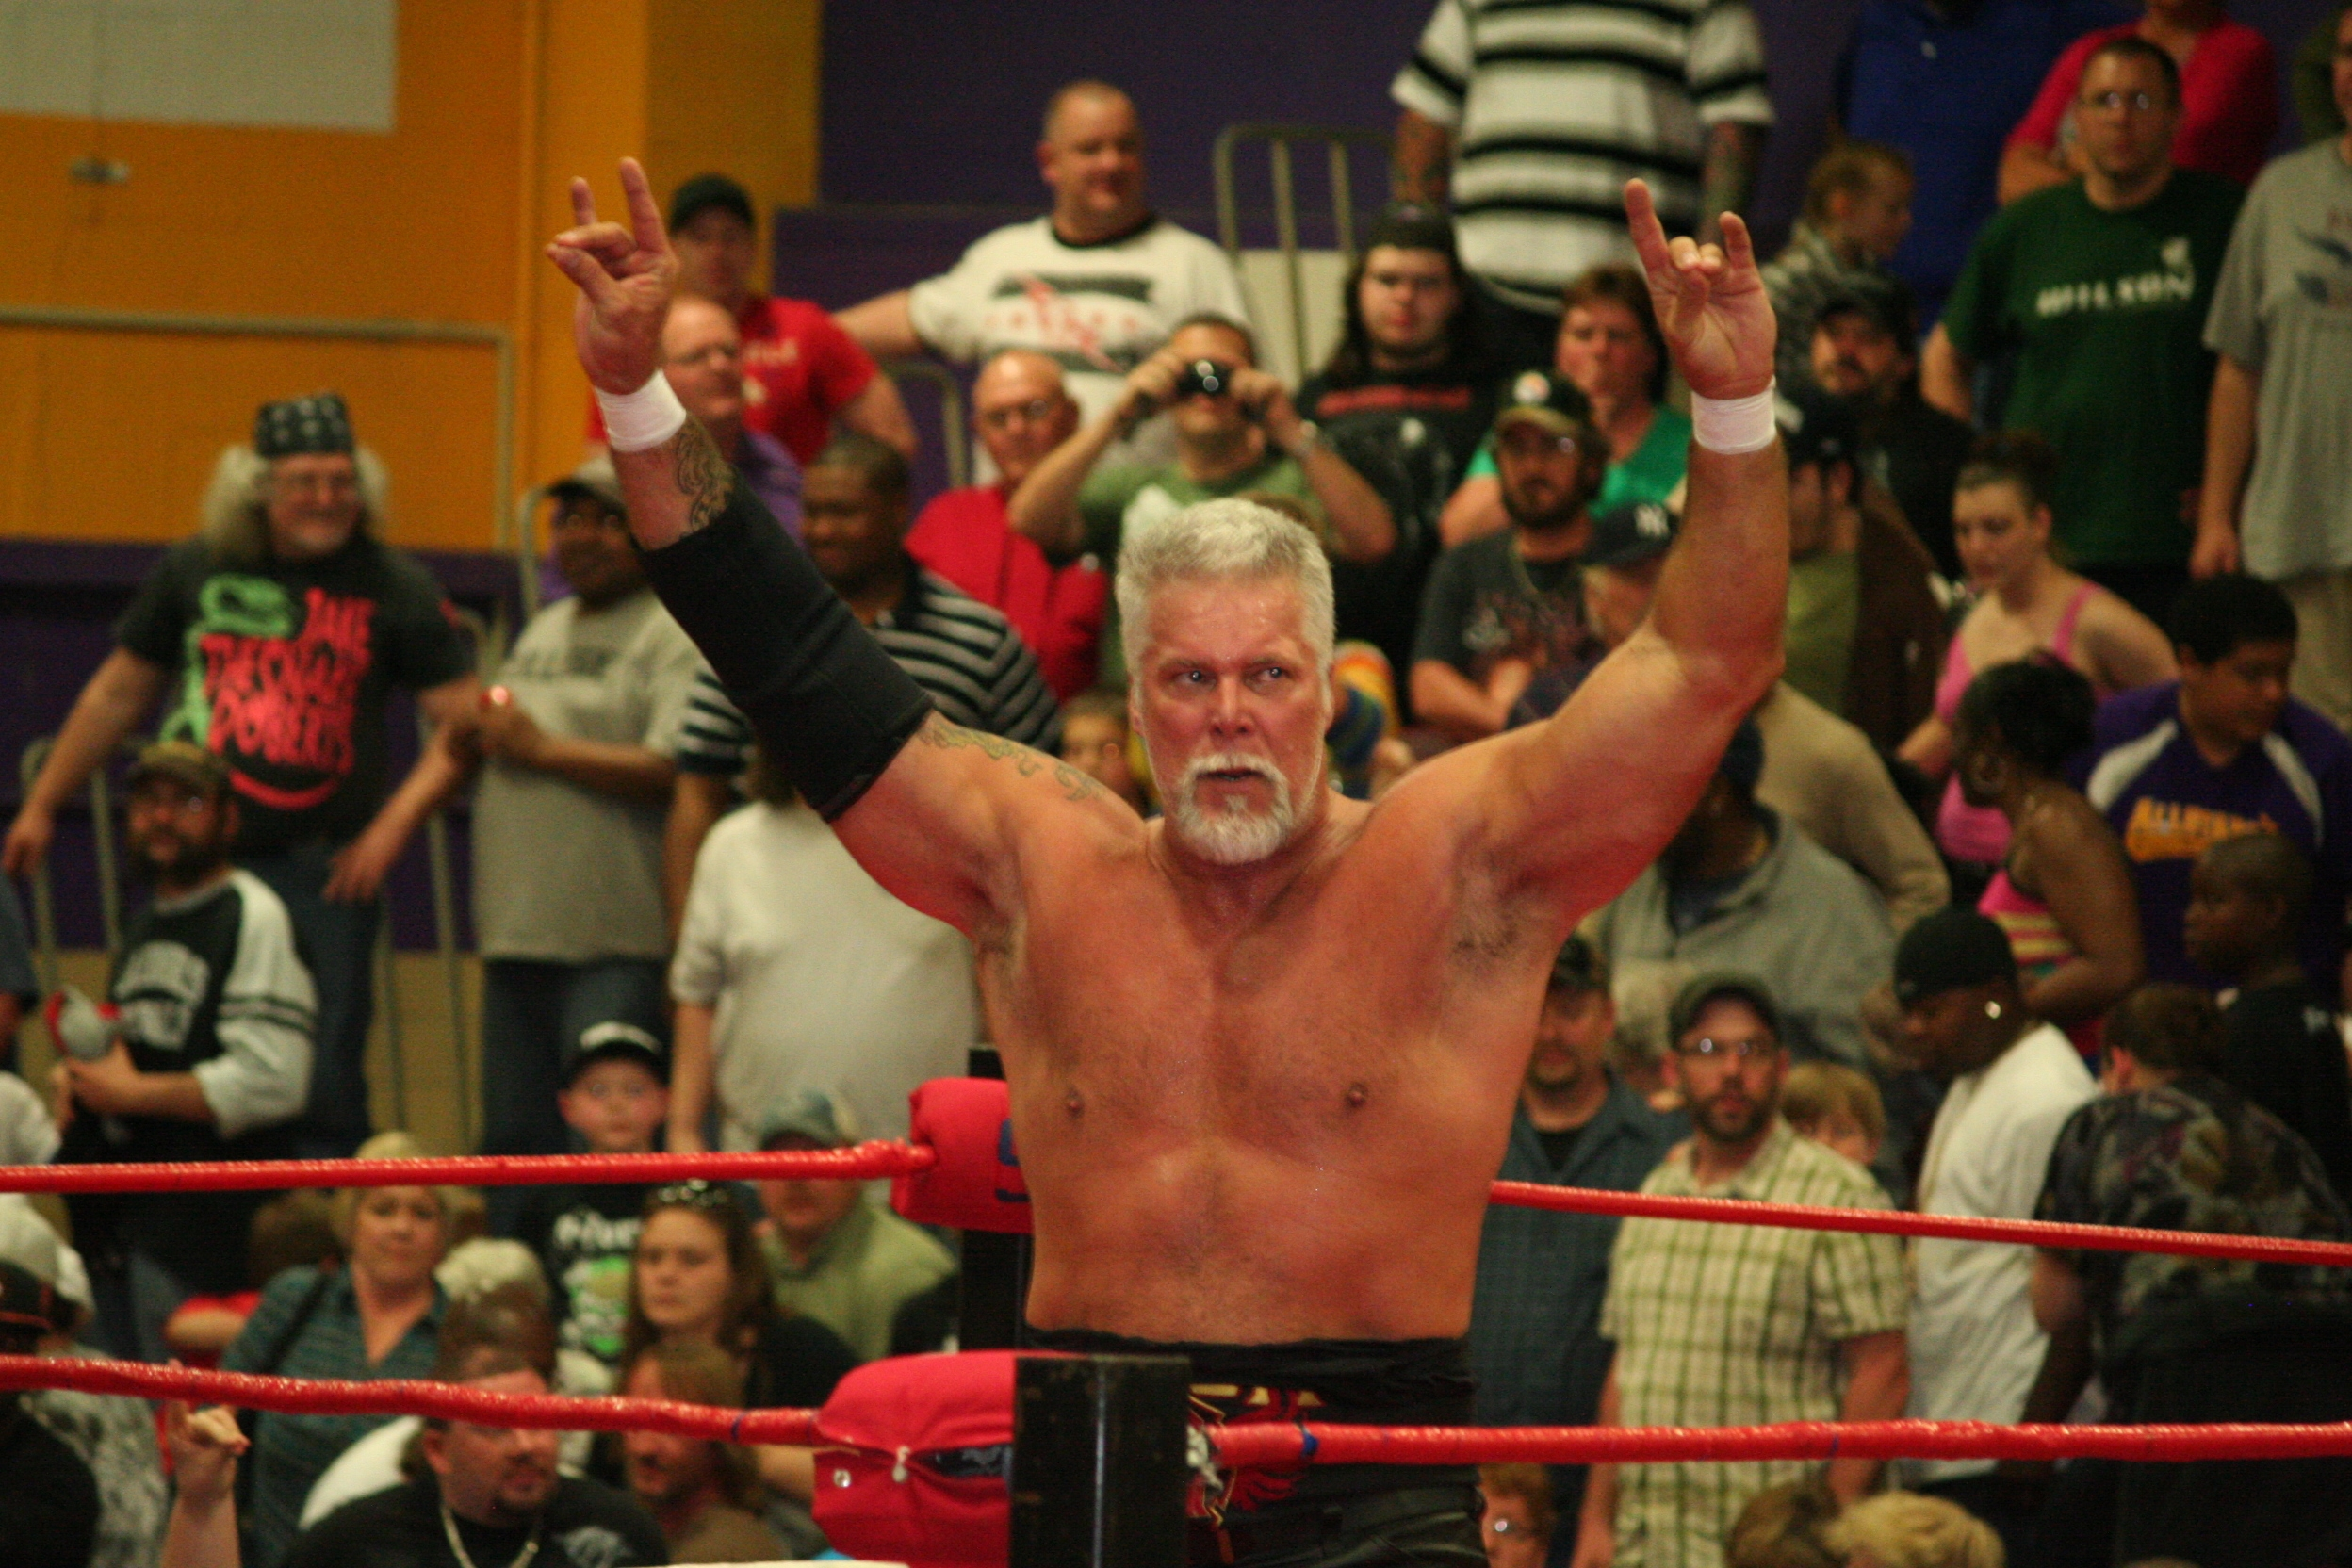 WCW 2 SCOTT RIGGS WRESTLING CARDS BORN IN SAVANNAH GEORGIA